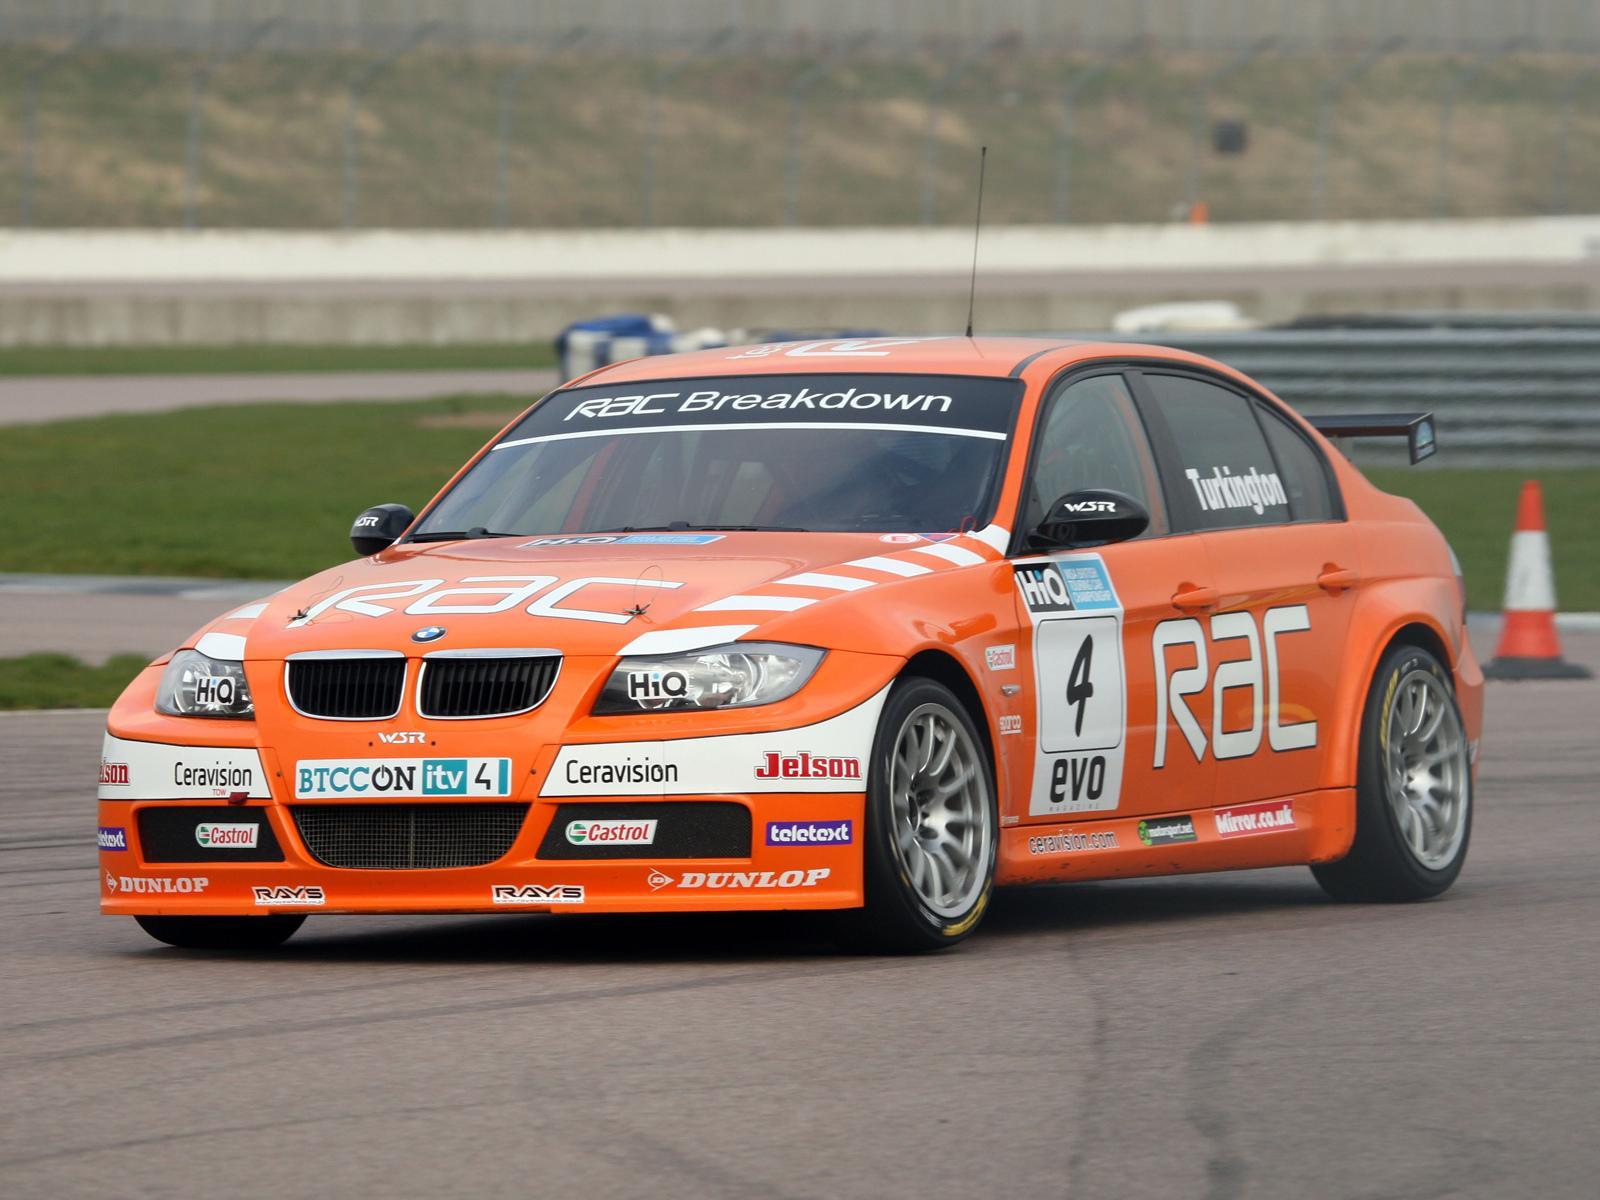 BTCC Racing wallpapers HD quality